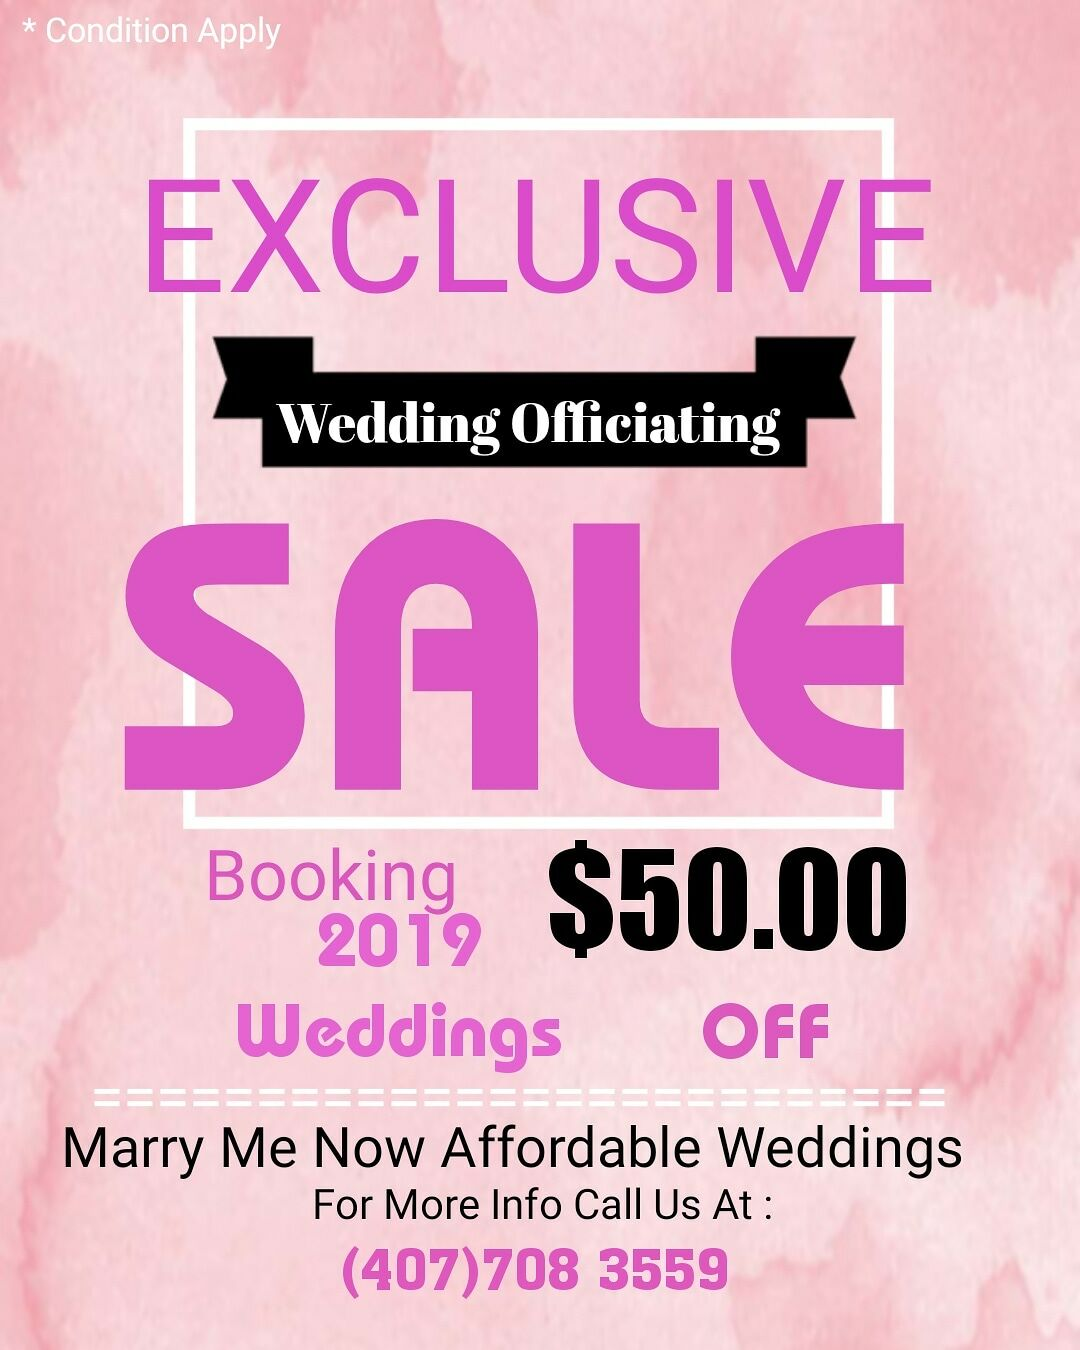 Marry Me Now Affordable Weddings - Sanford, FL